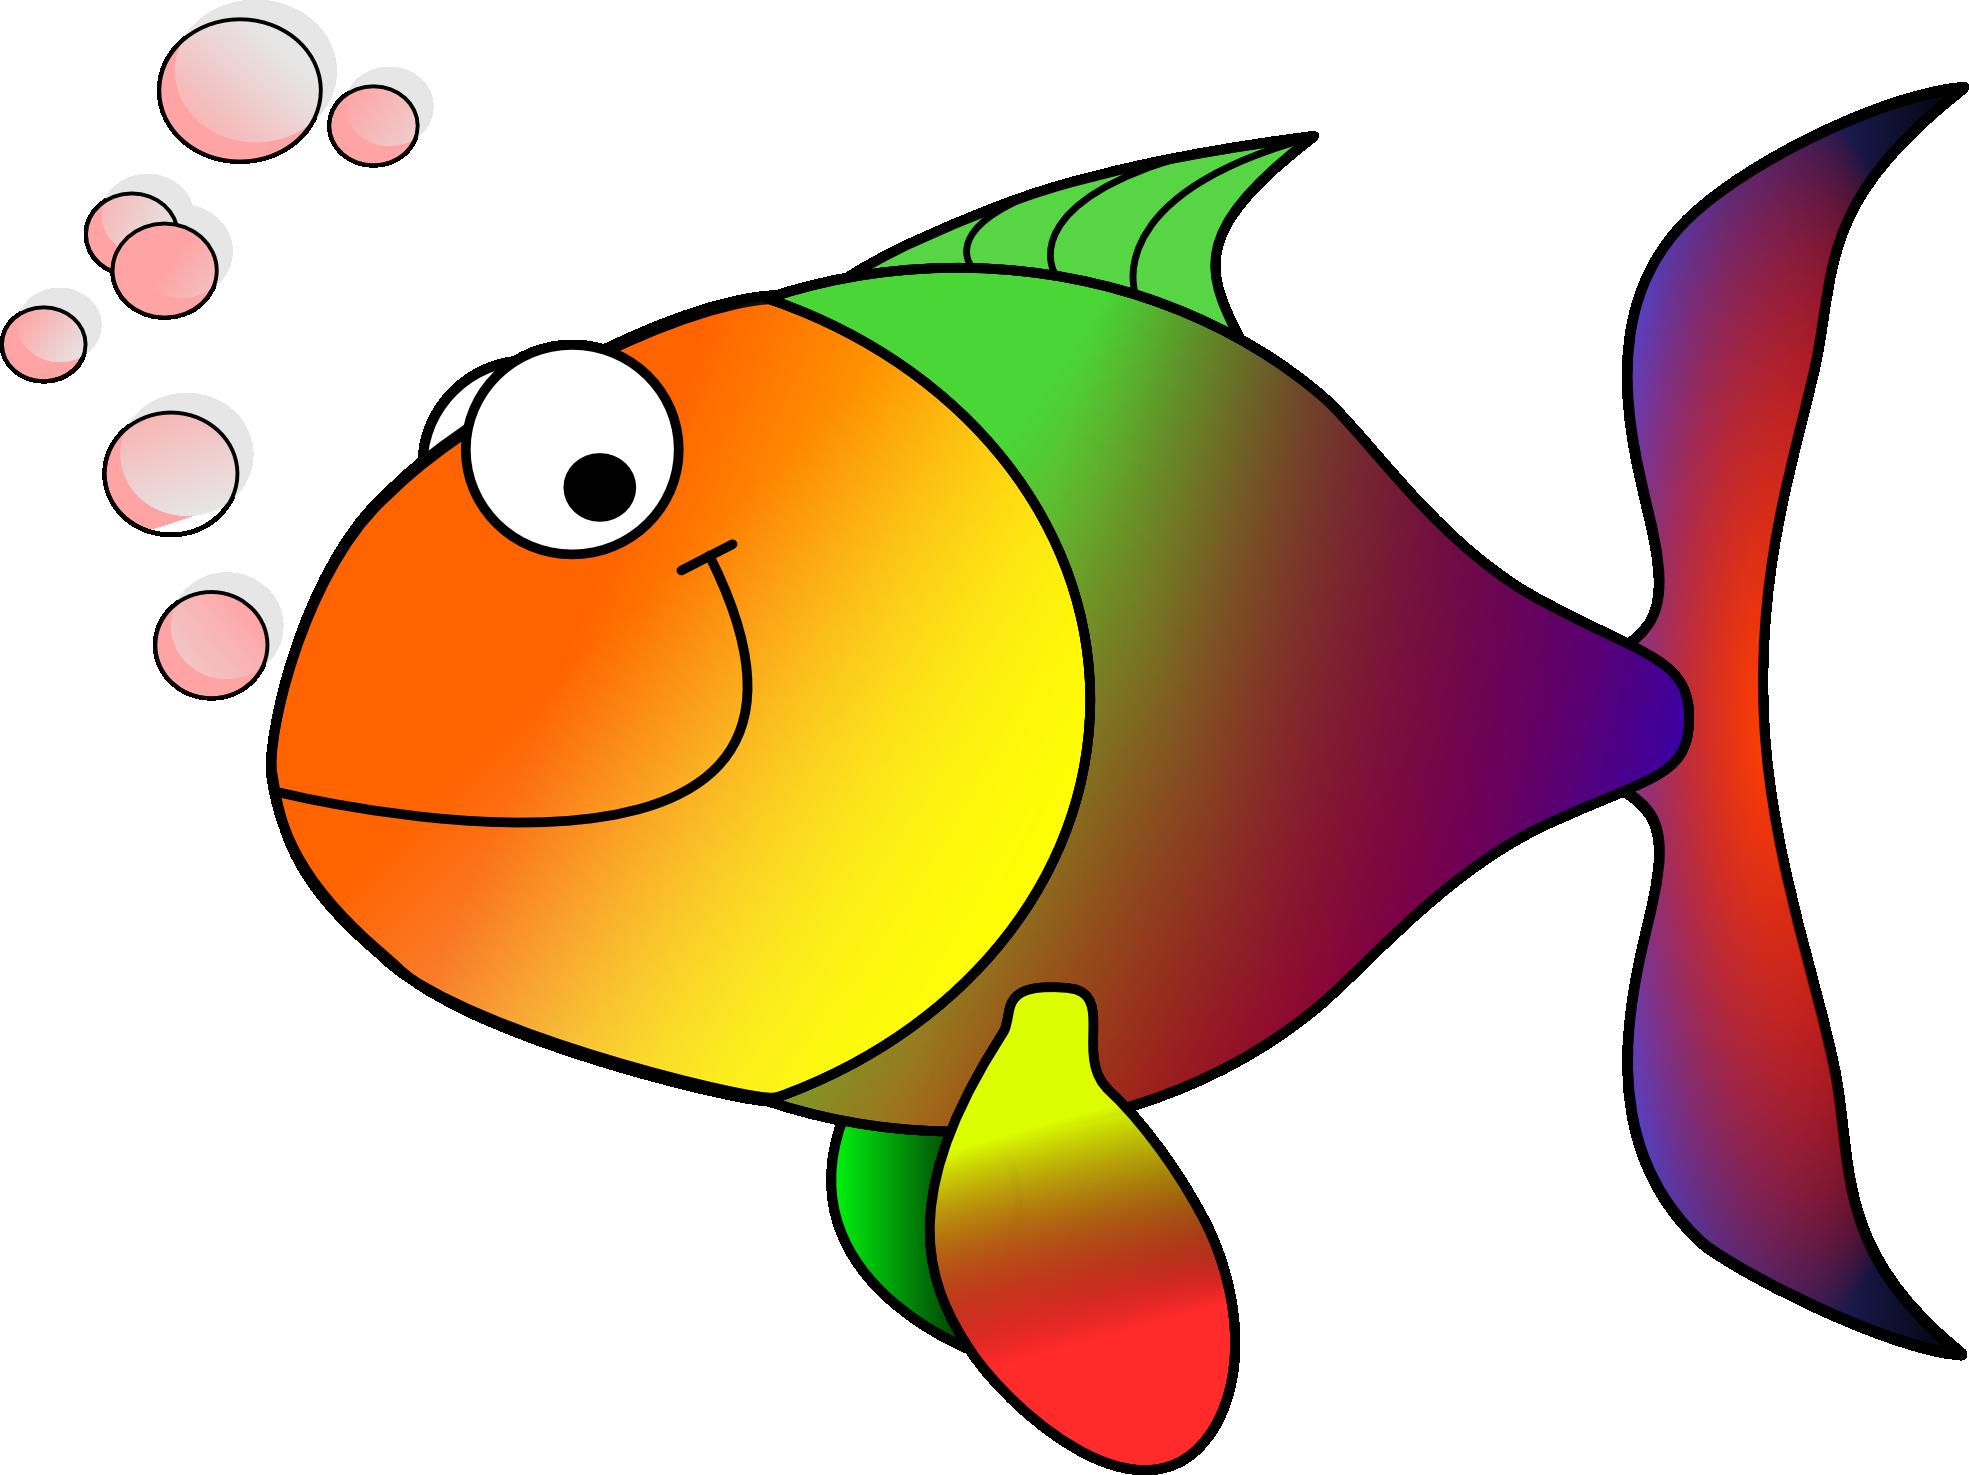 Coral Reef Background clipart - Illustration, Fish, Blue, transparent clip  art